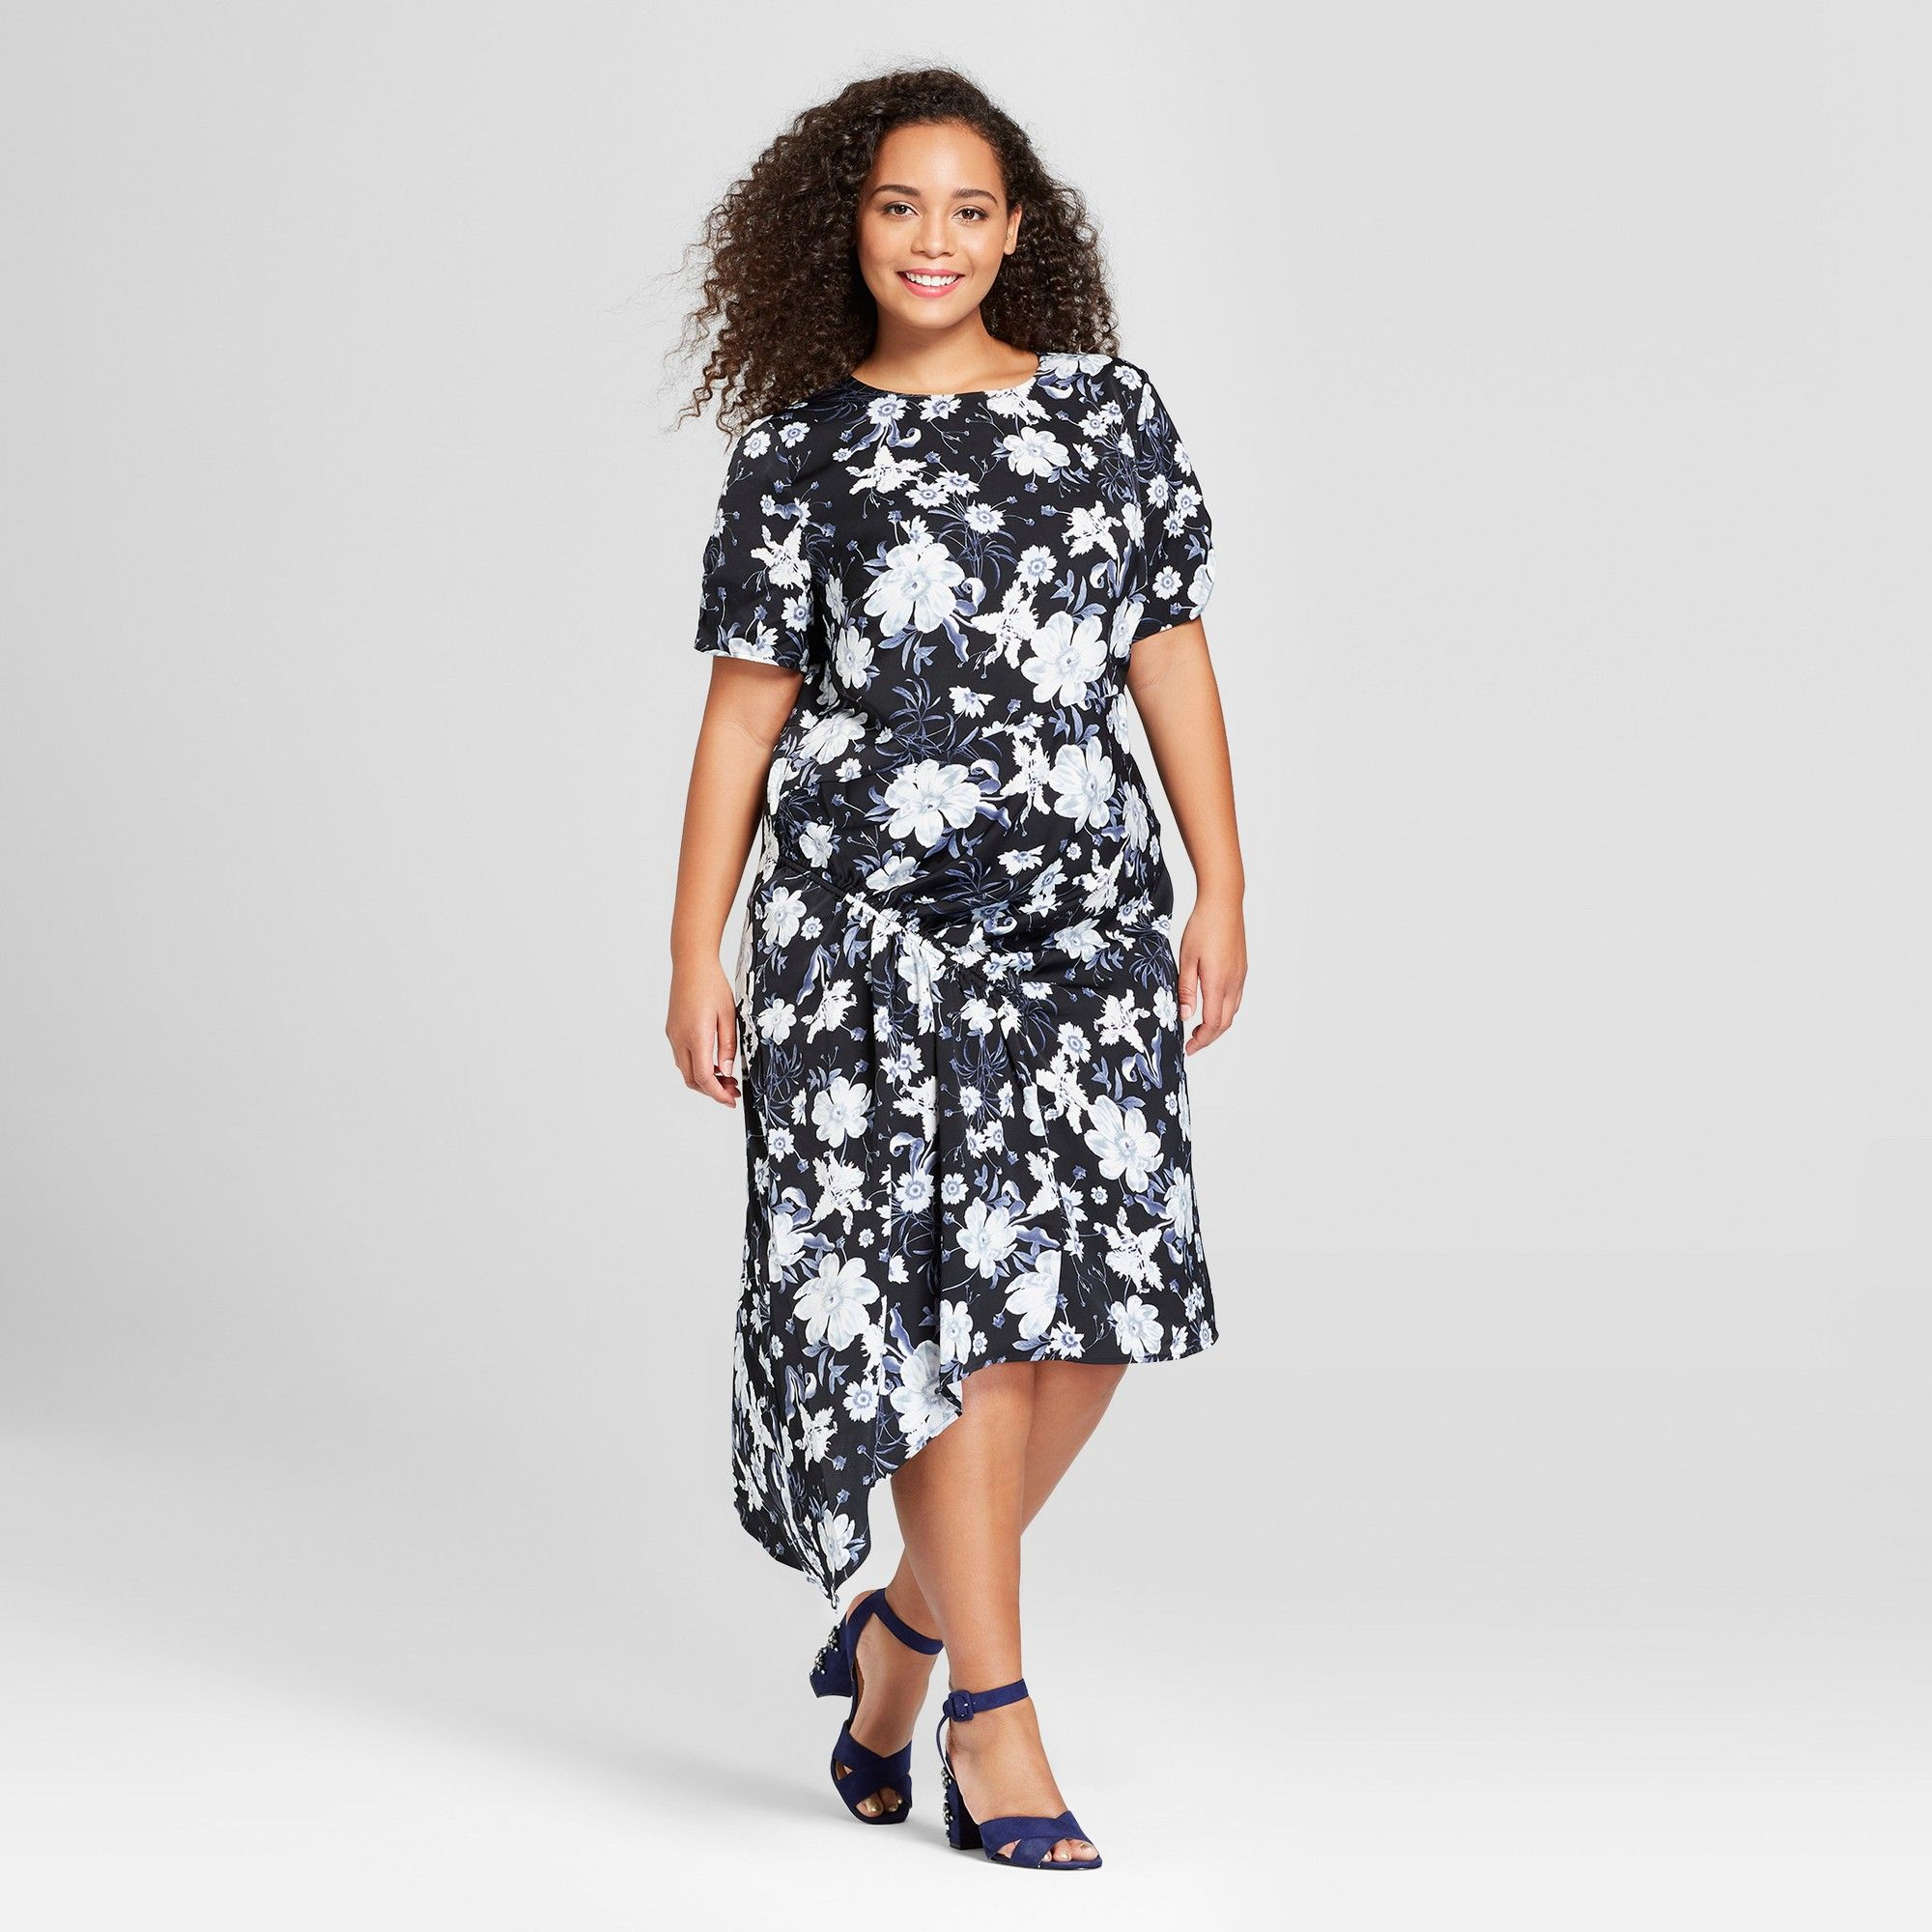 24a01b82b96 Women s Plus Size Short Sleeve Asymmetric Shirred Midi Dress - Who What Wear  Black Floral 1X